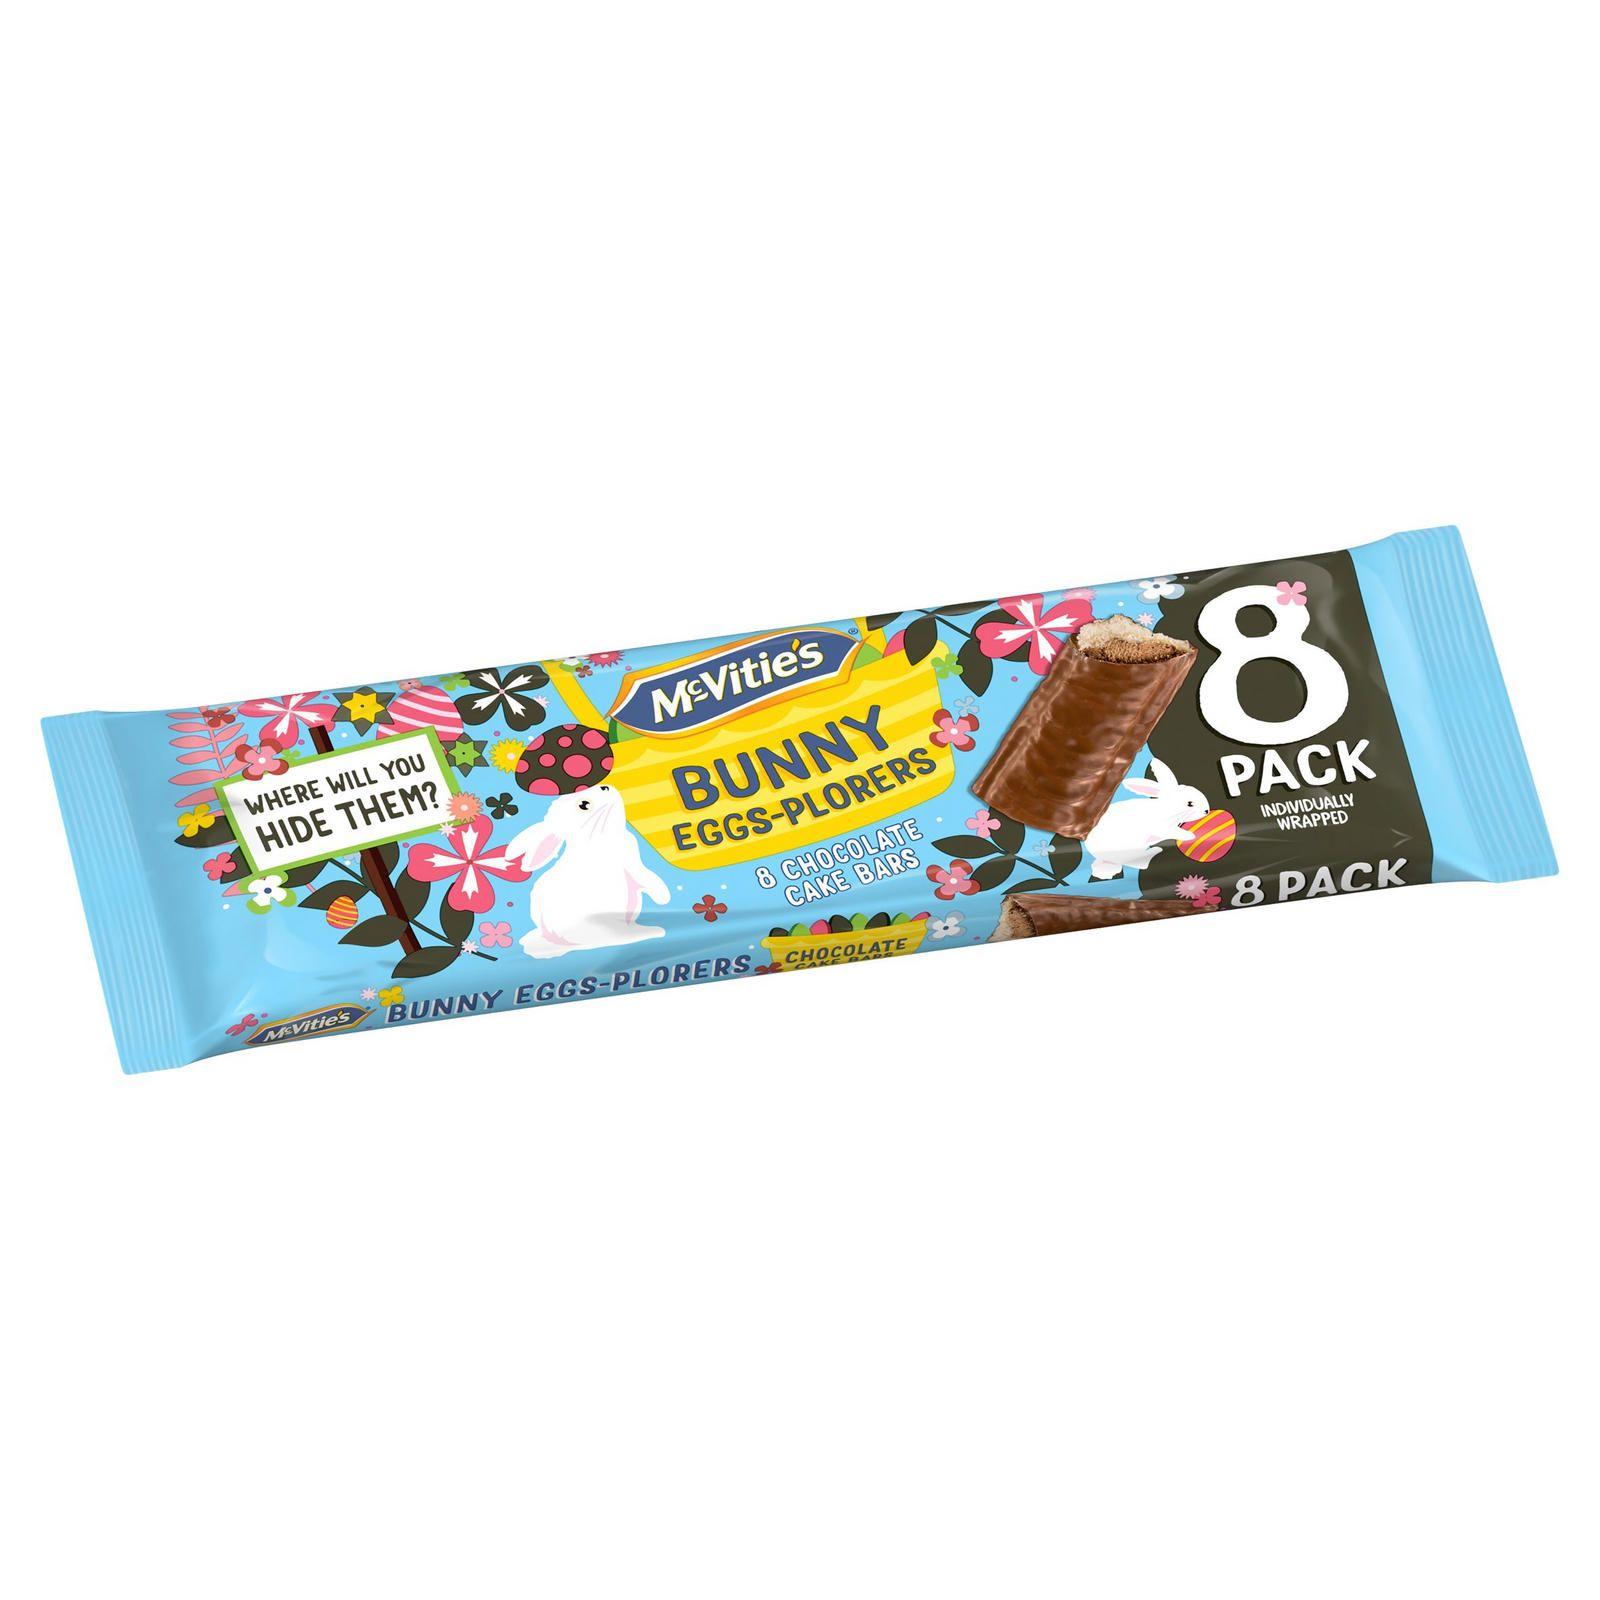 McVitie's Bunny Eggs-Plorers 8 Chocolate Cake Bars 39p instore at FarmFoods (Aylesbury)